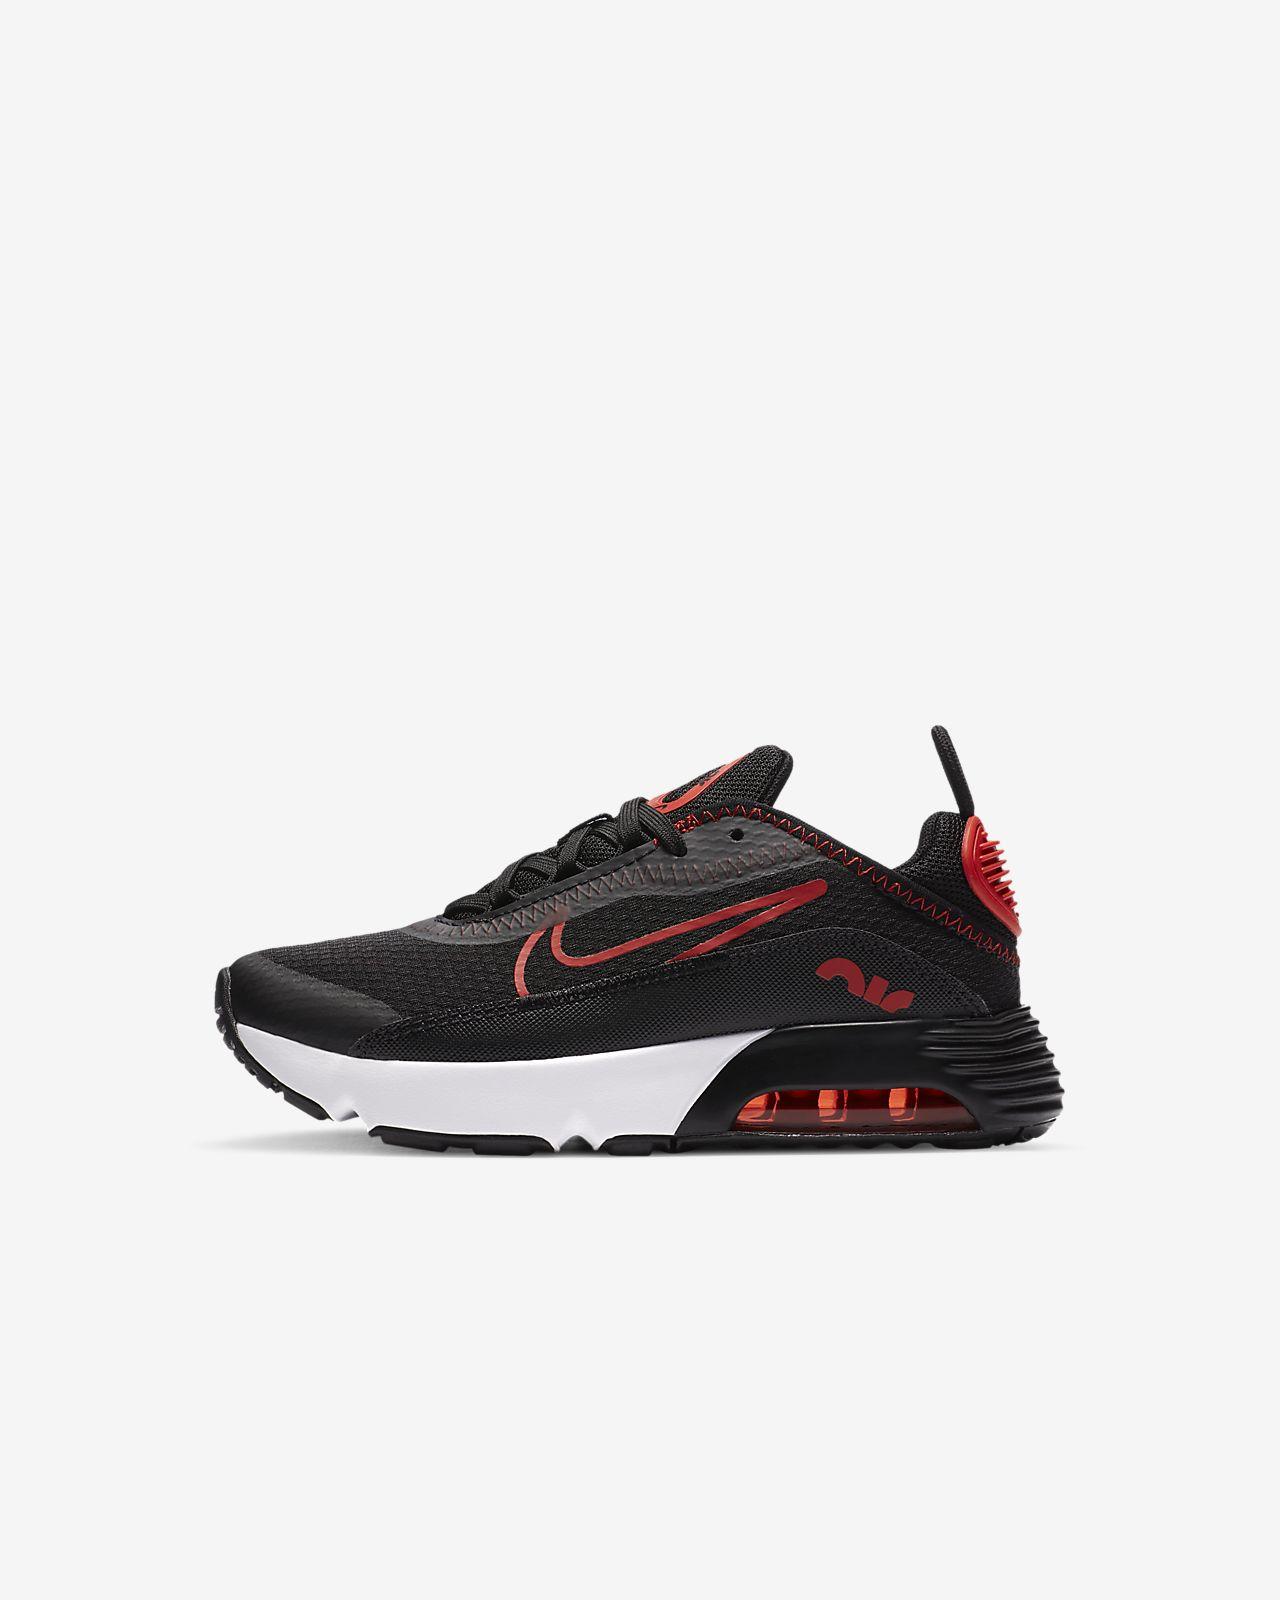 Nike Air Max 2090-sko til små børn